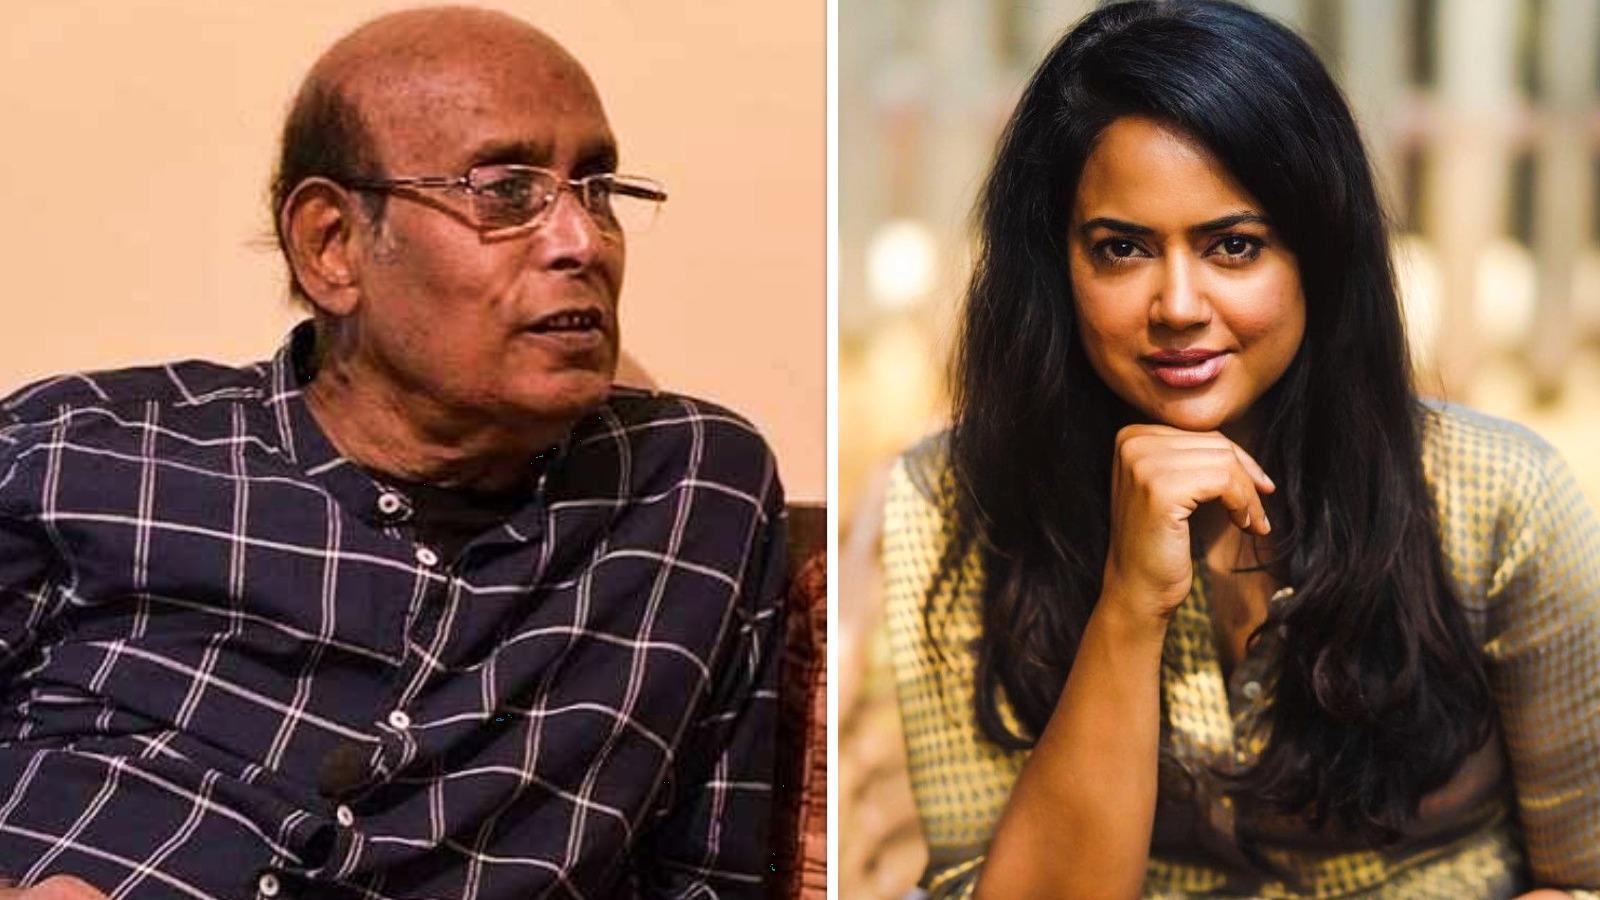 Veteran filmmaker Buddhadeb Dasgupta dies in Kolkata: From Sameera Reddy to Nawazuddin Siddiqui, Bollywood mourns tragic loss | Hindi Movie News – Bollywood – Times of India